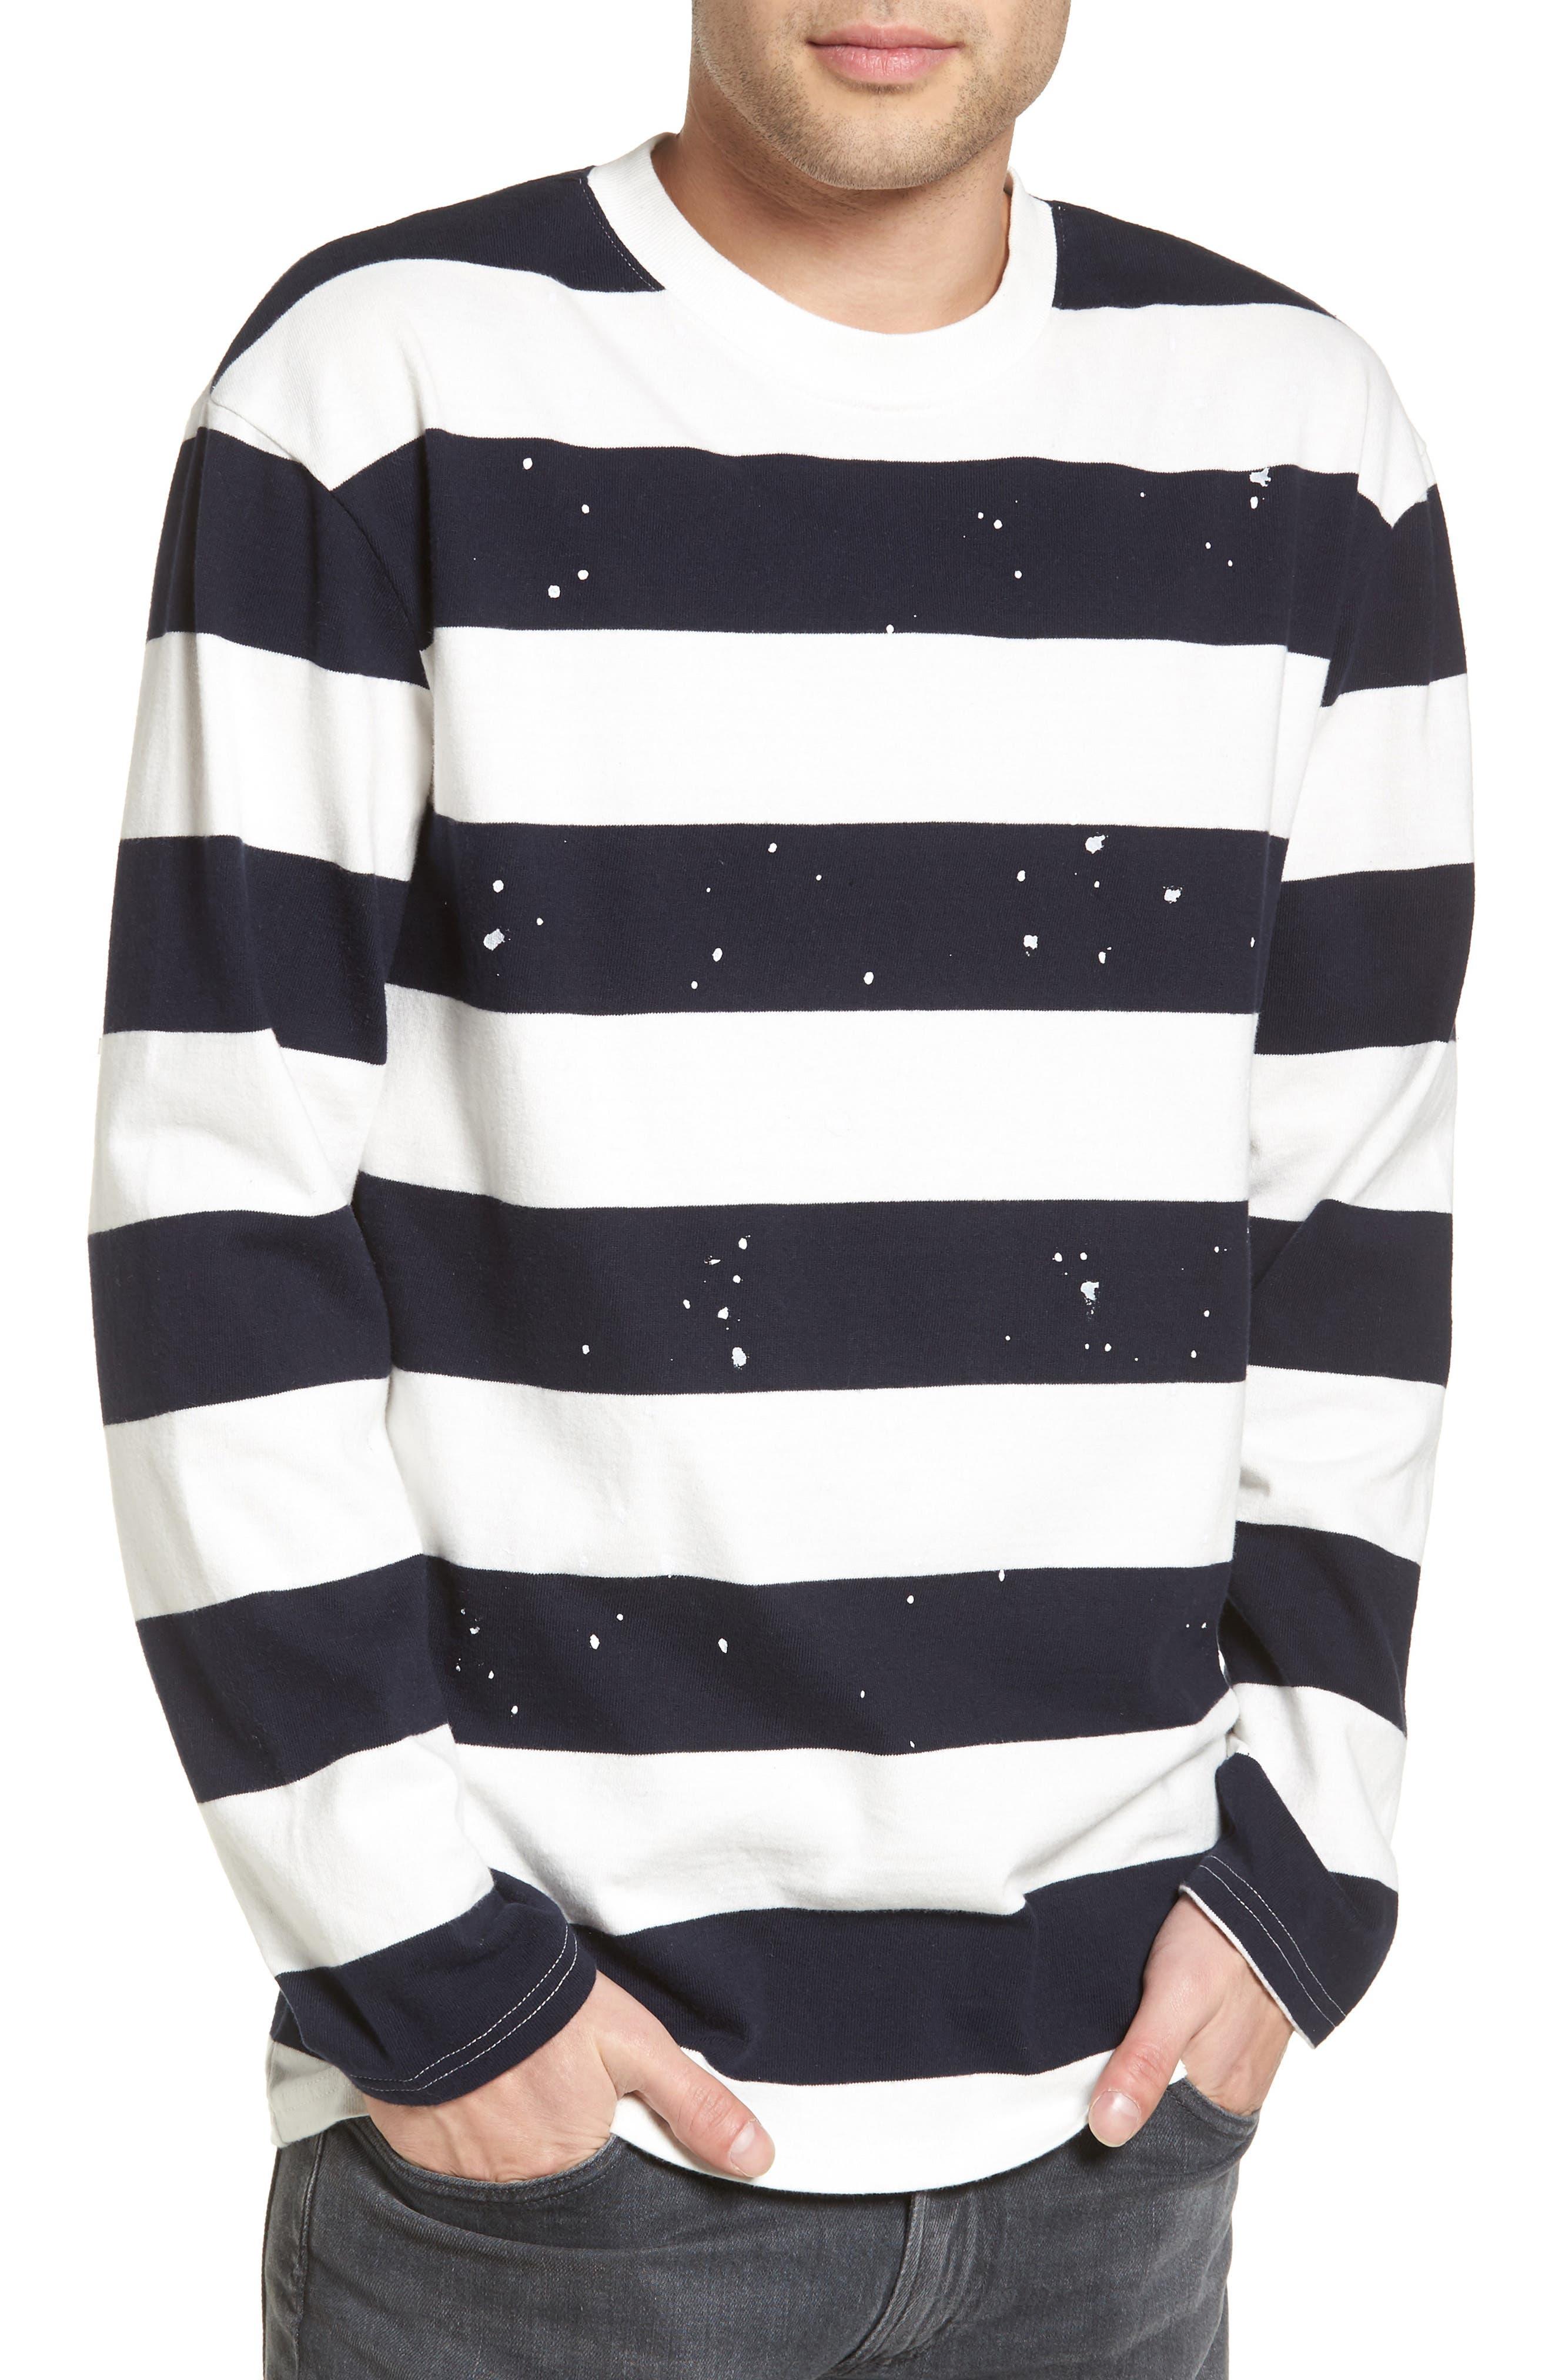 The Rail Paint Splatter Sweatshirt